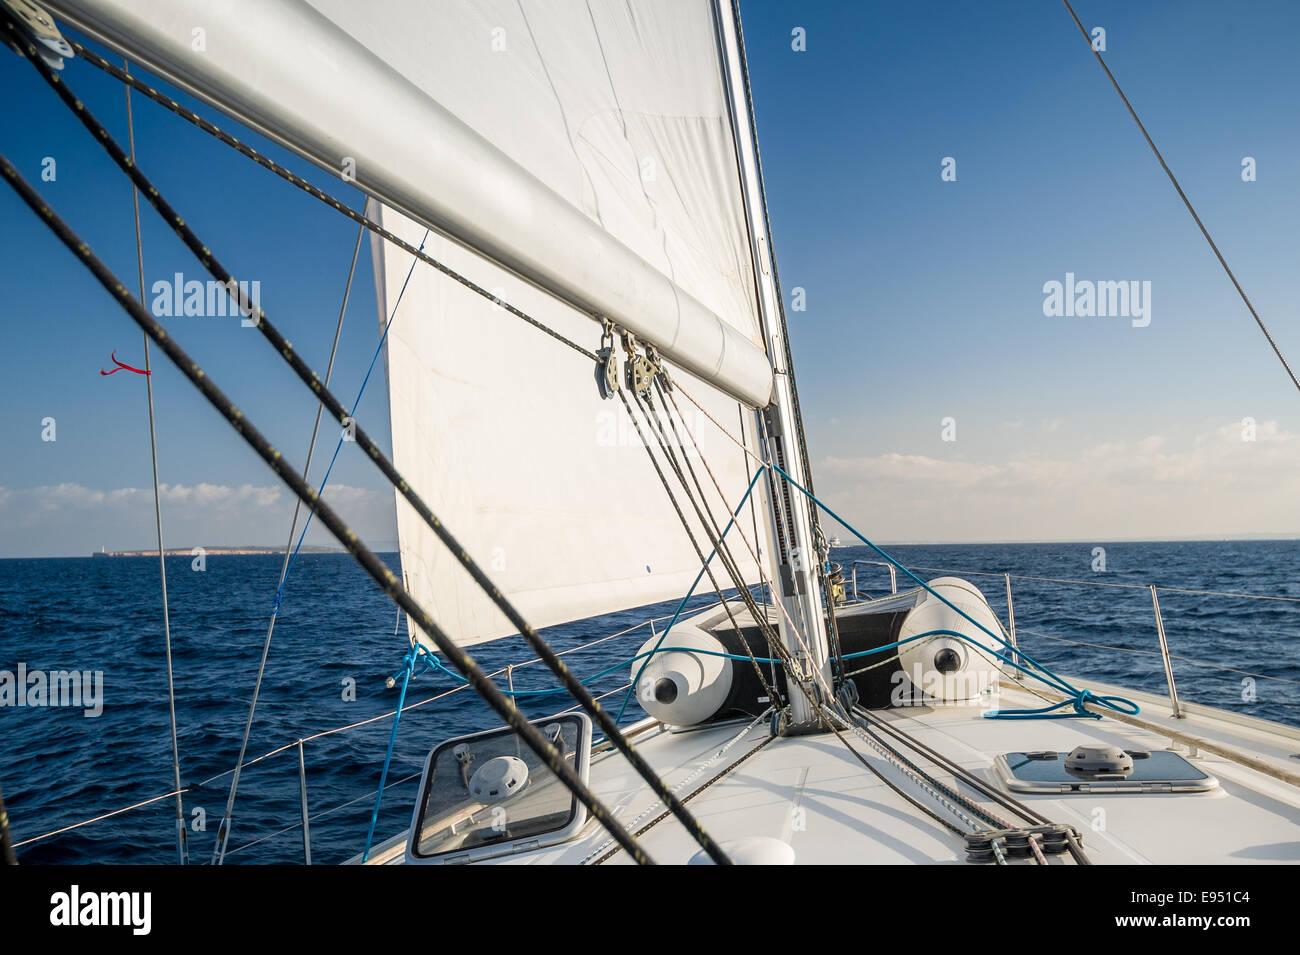 Sailing - Stock Image